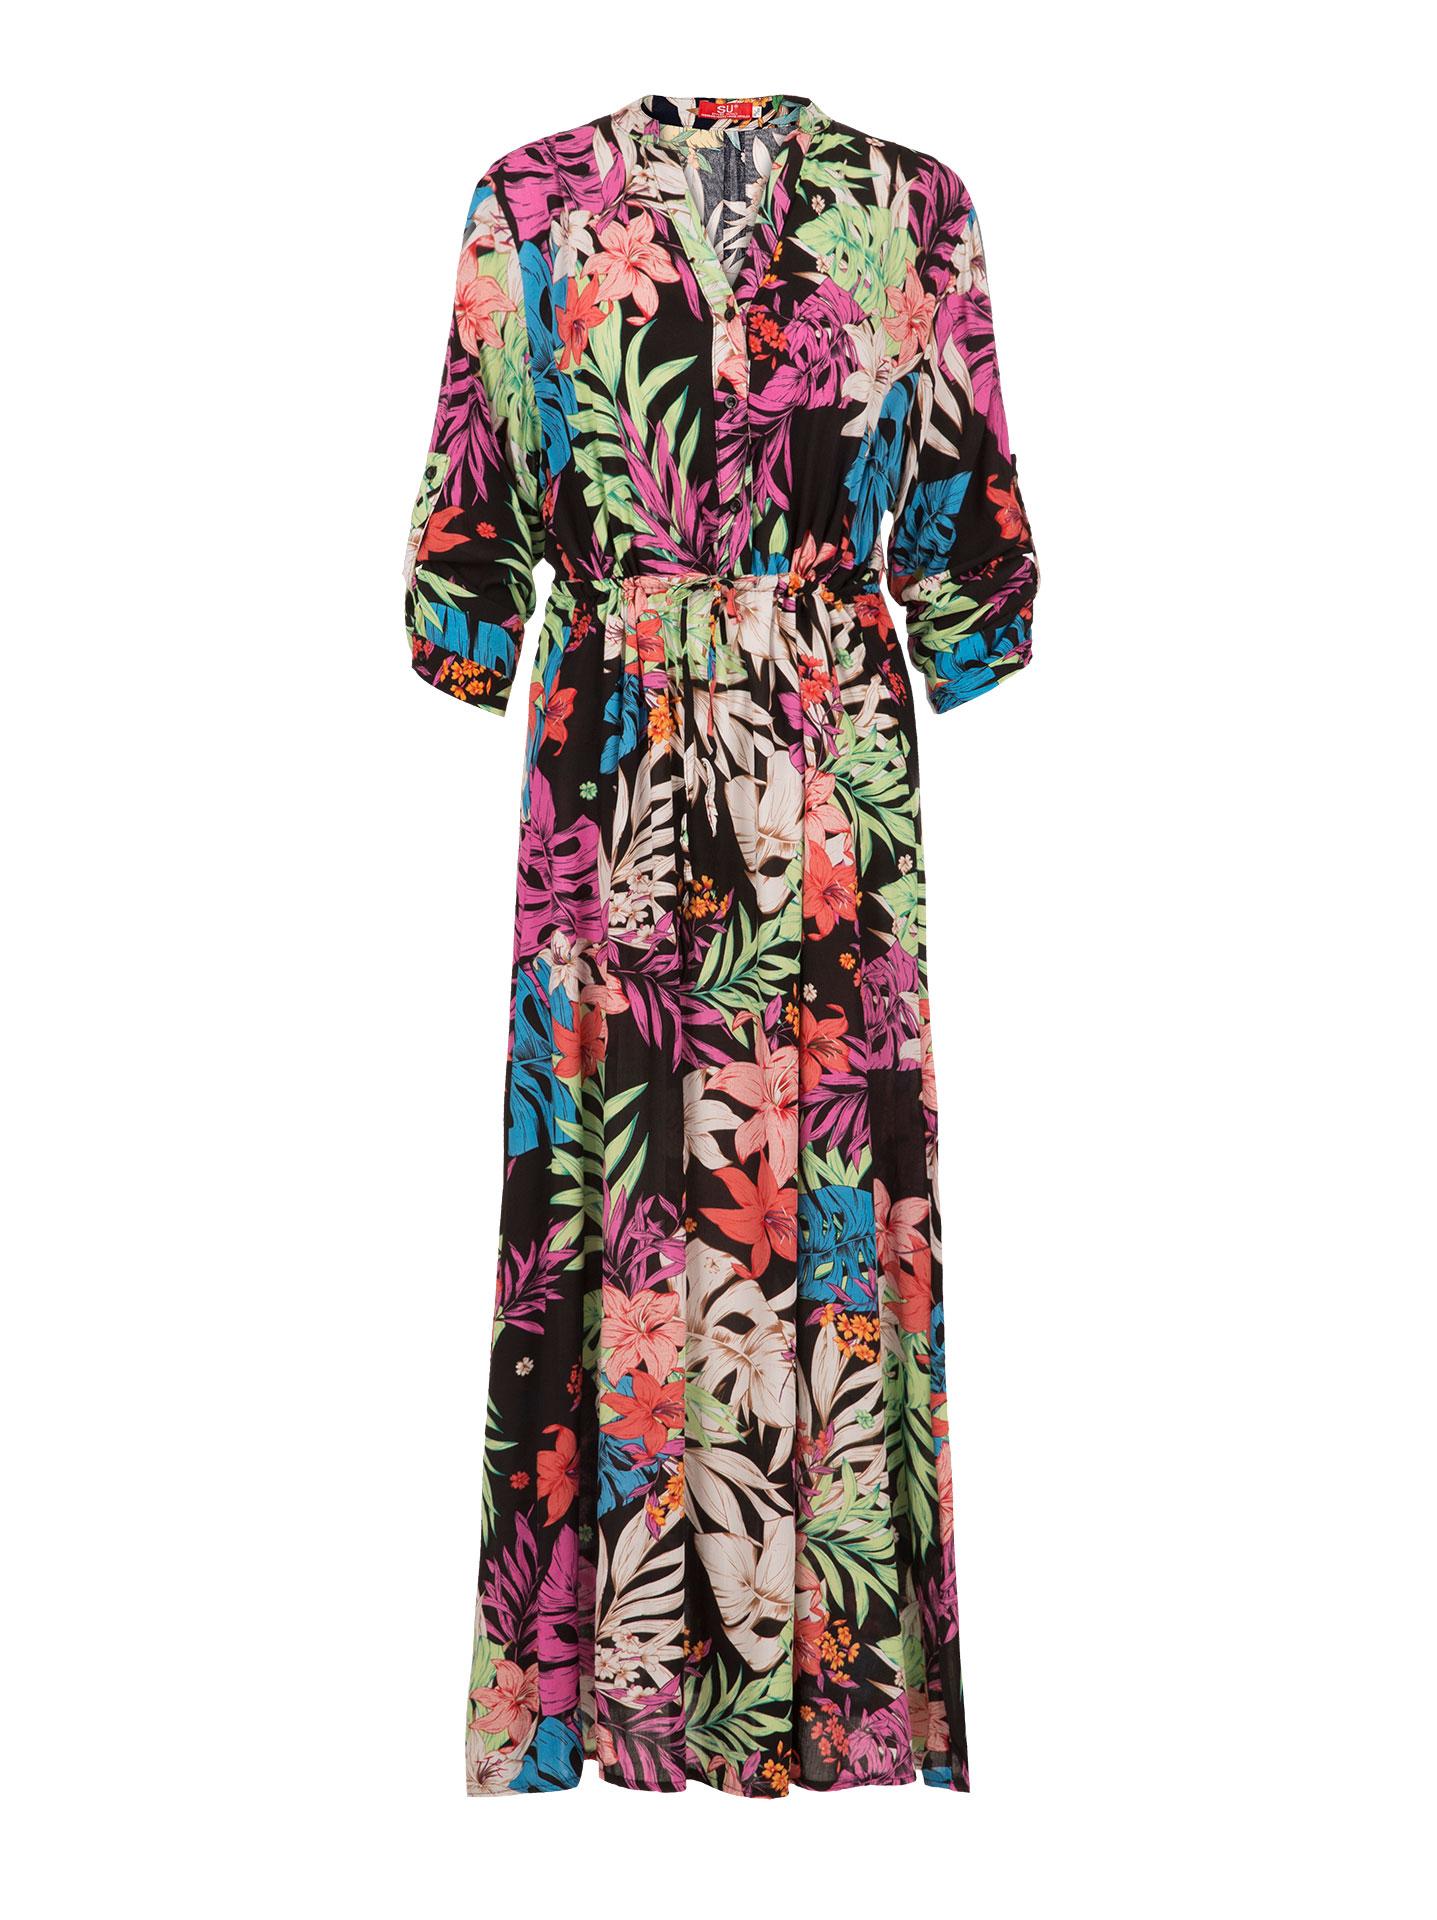 d5e3a9f96a5 Φόρεμα με εσωτερικό κορδόνι σε μαυρο, 17,95€   Celestino